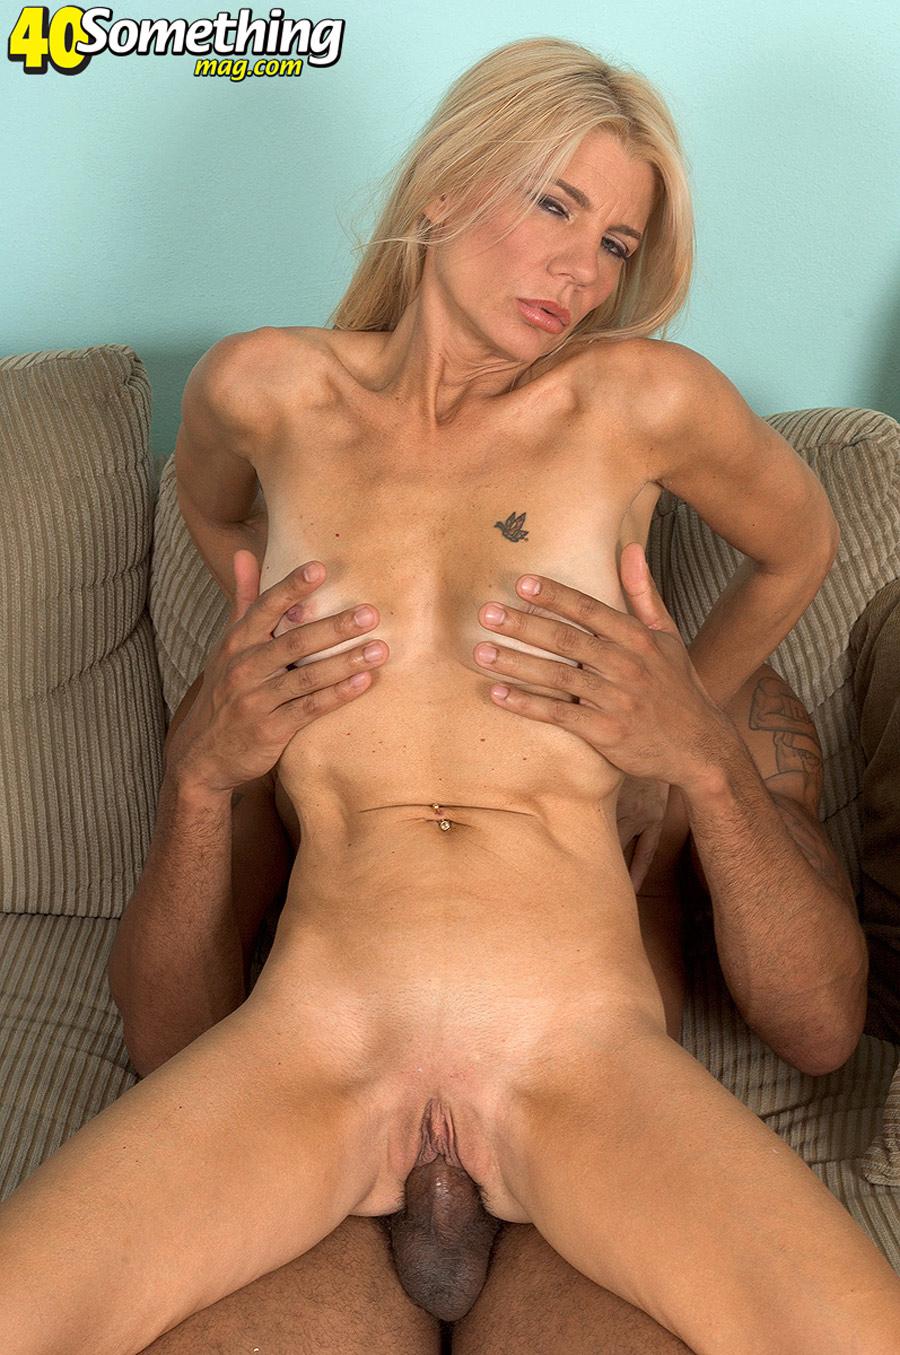 Barbie Page Cougar 49